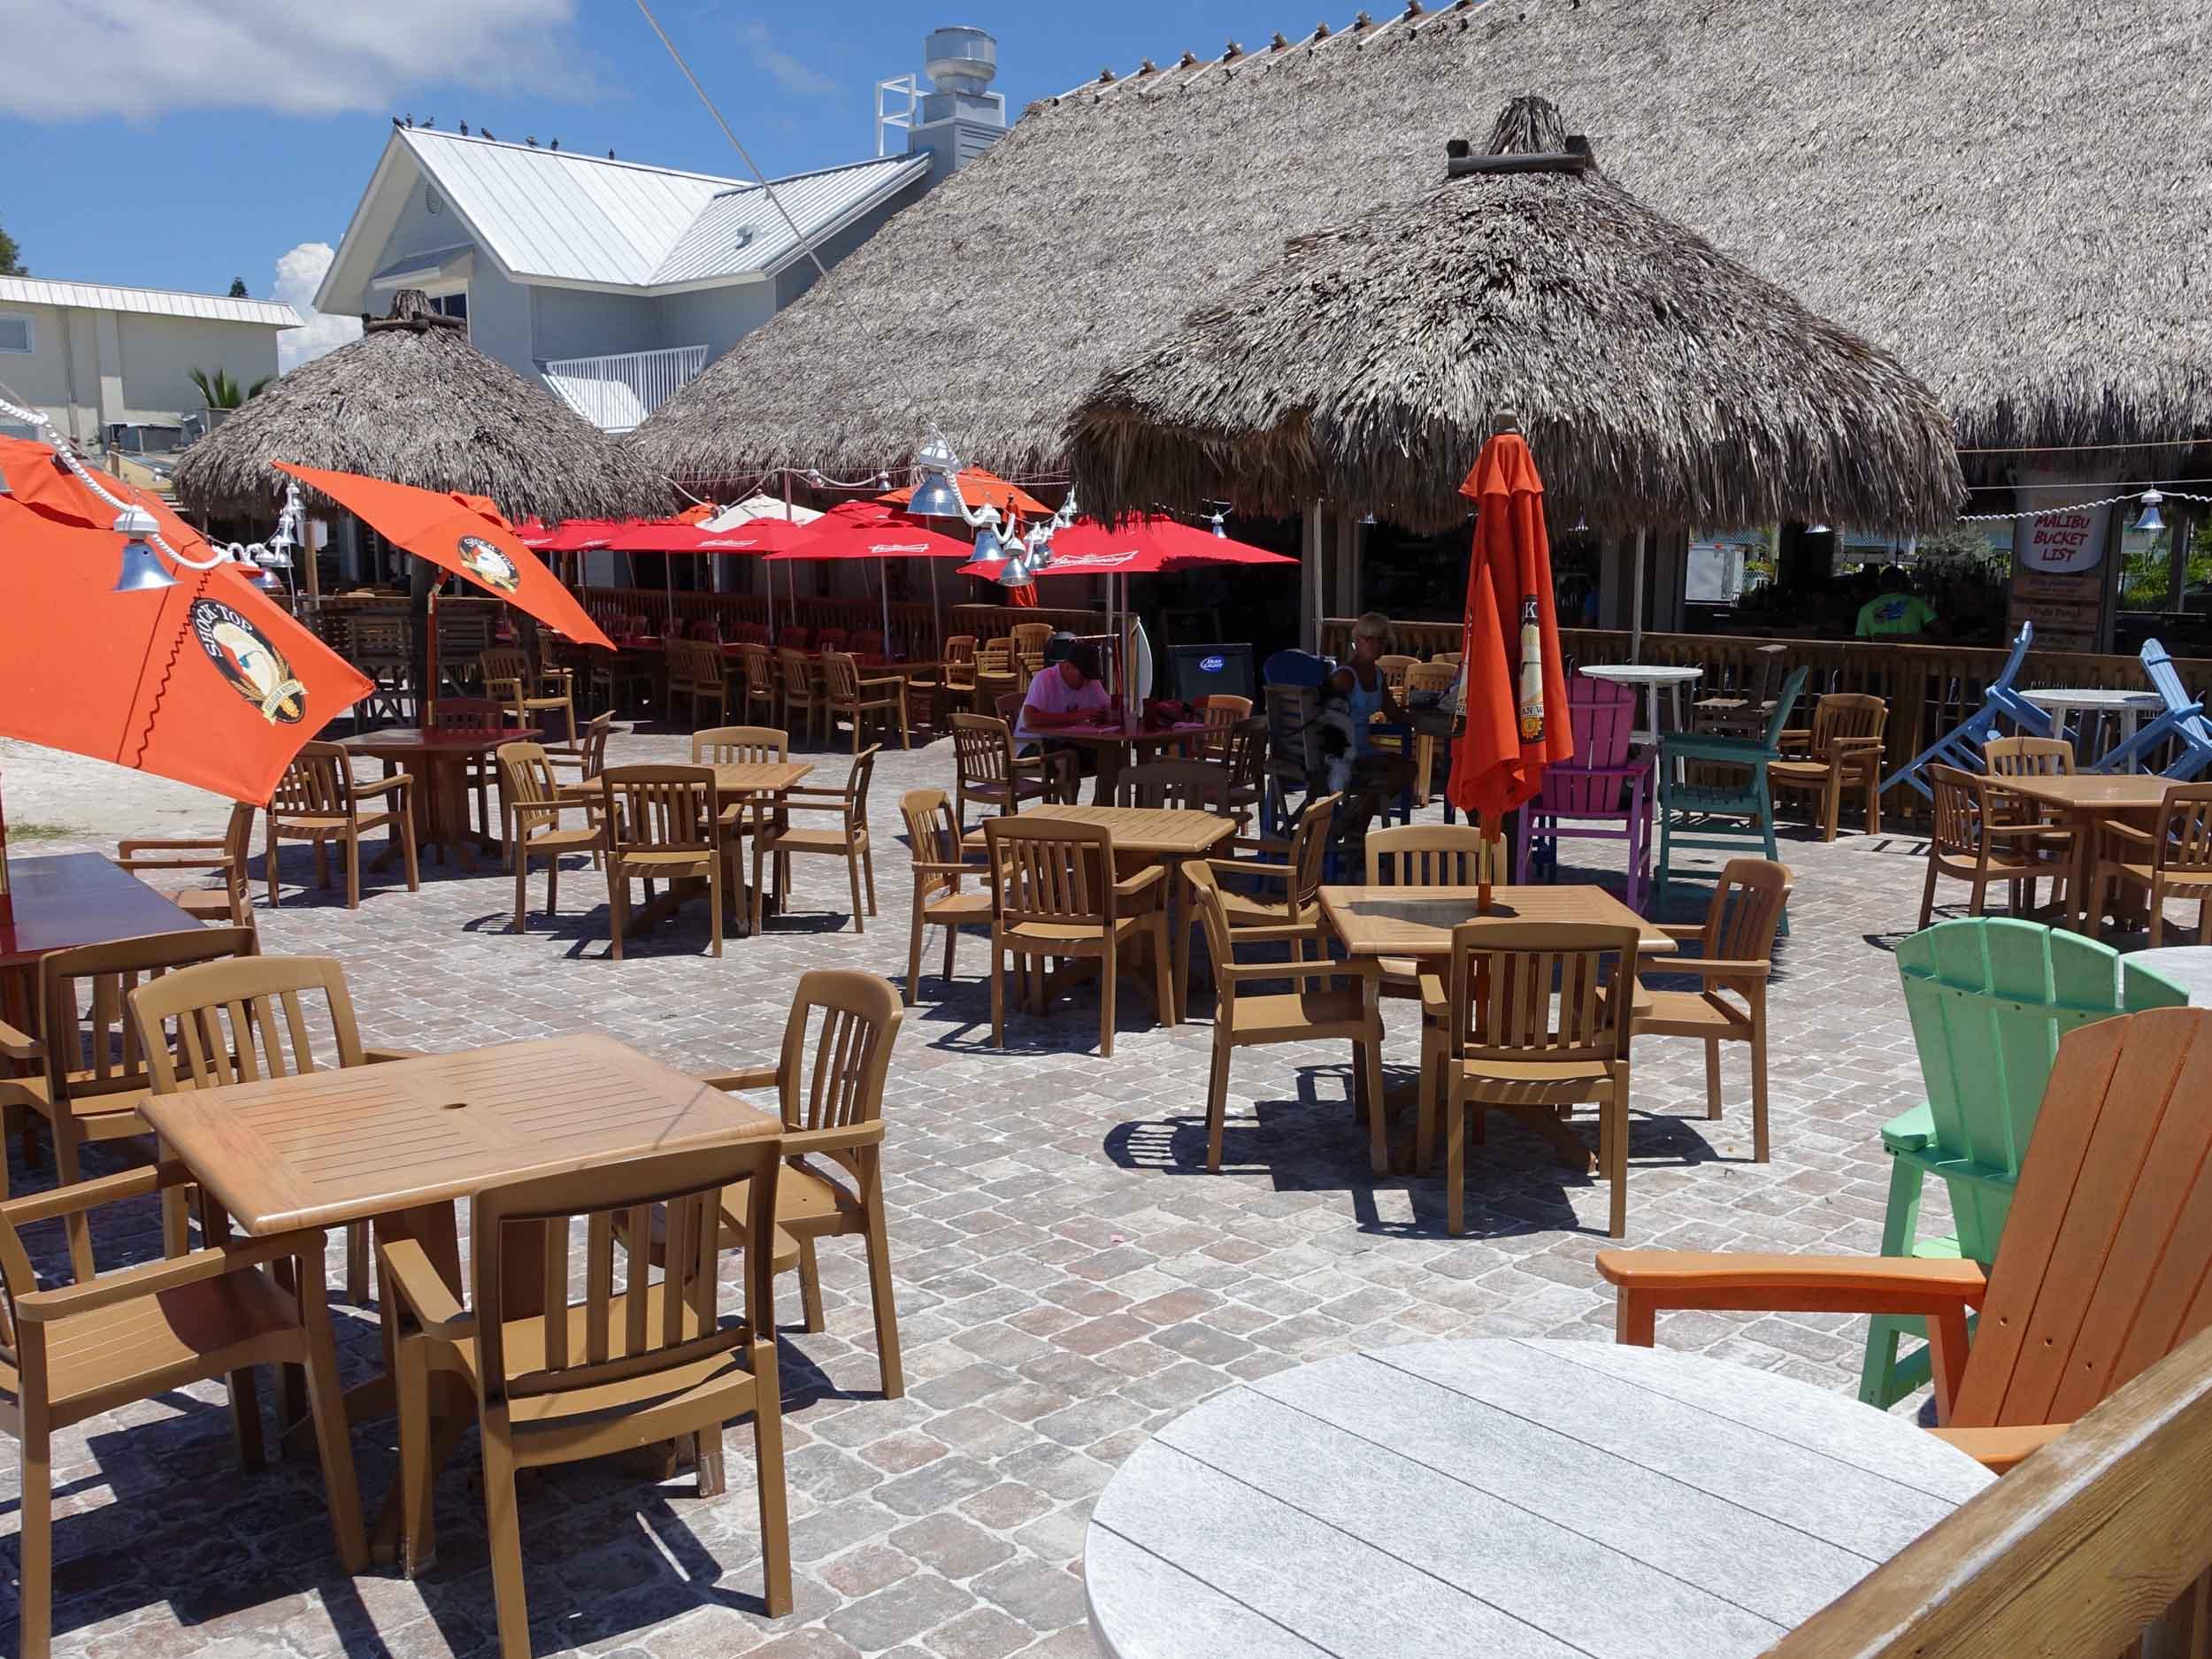 Gulf Drive Cafe Patio